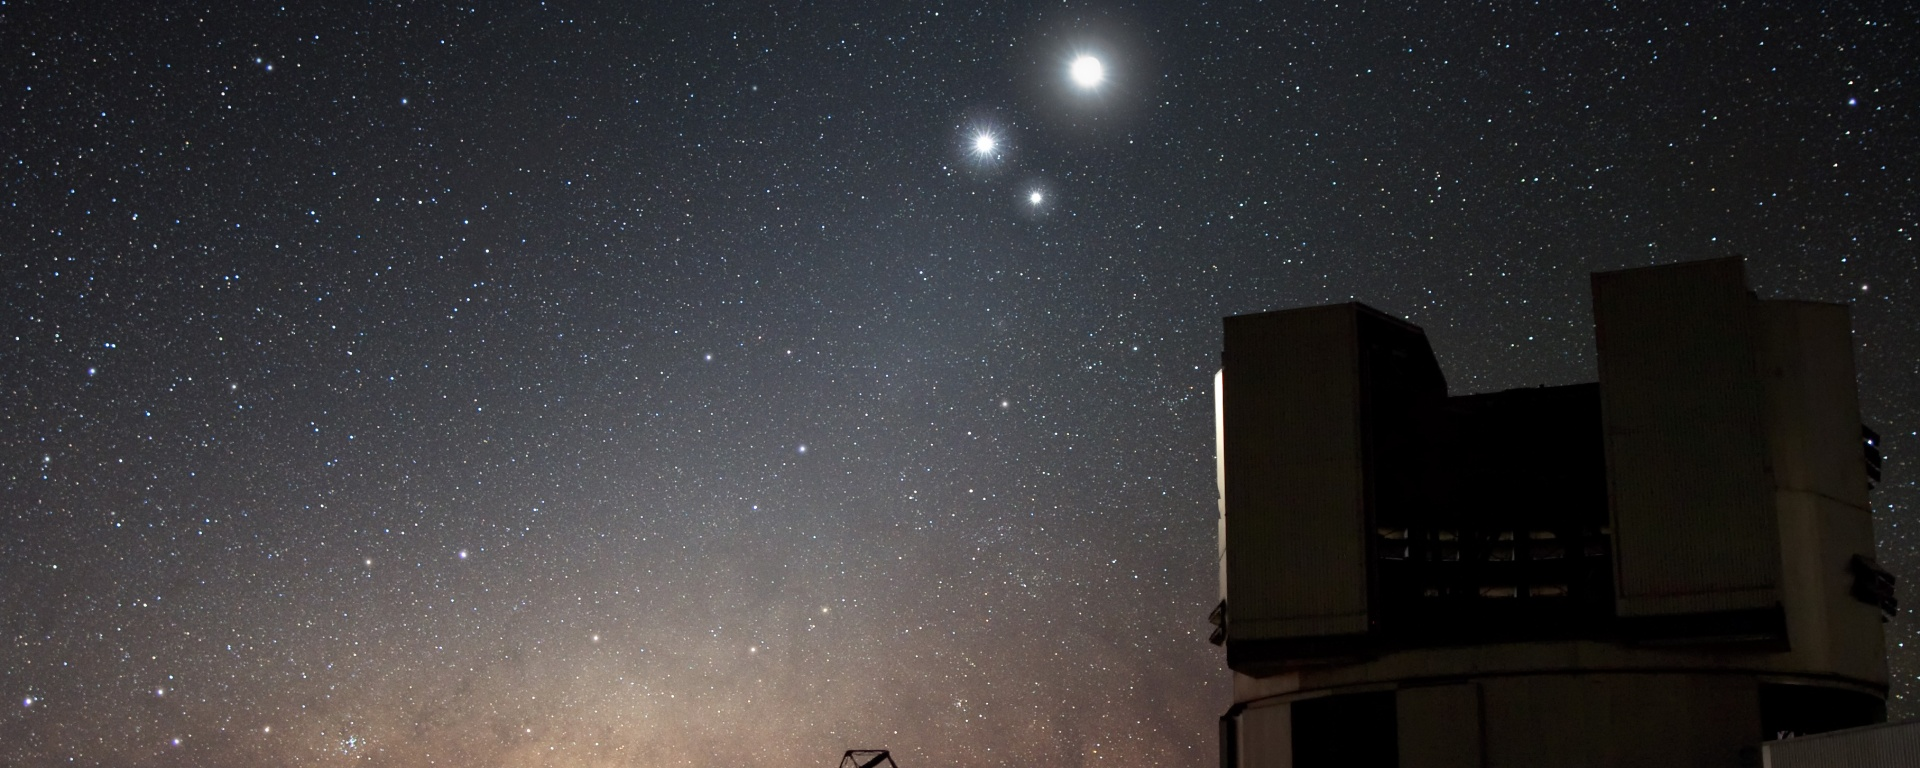 Astronomy Calendar 2022.2022 Celestial Events Calendar Orion Bear Astronomy